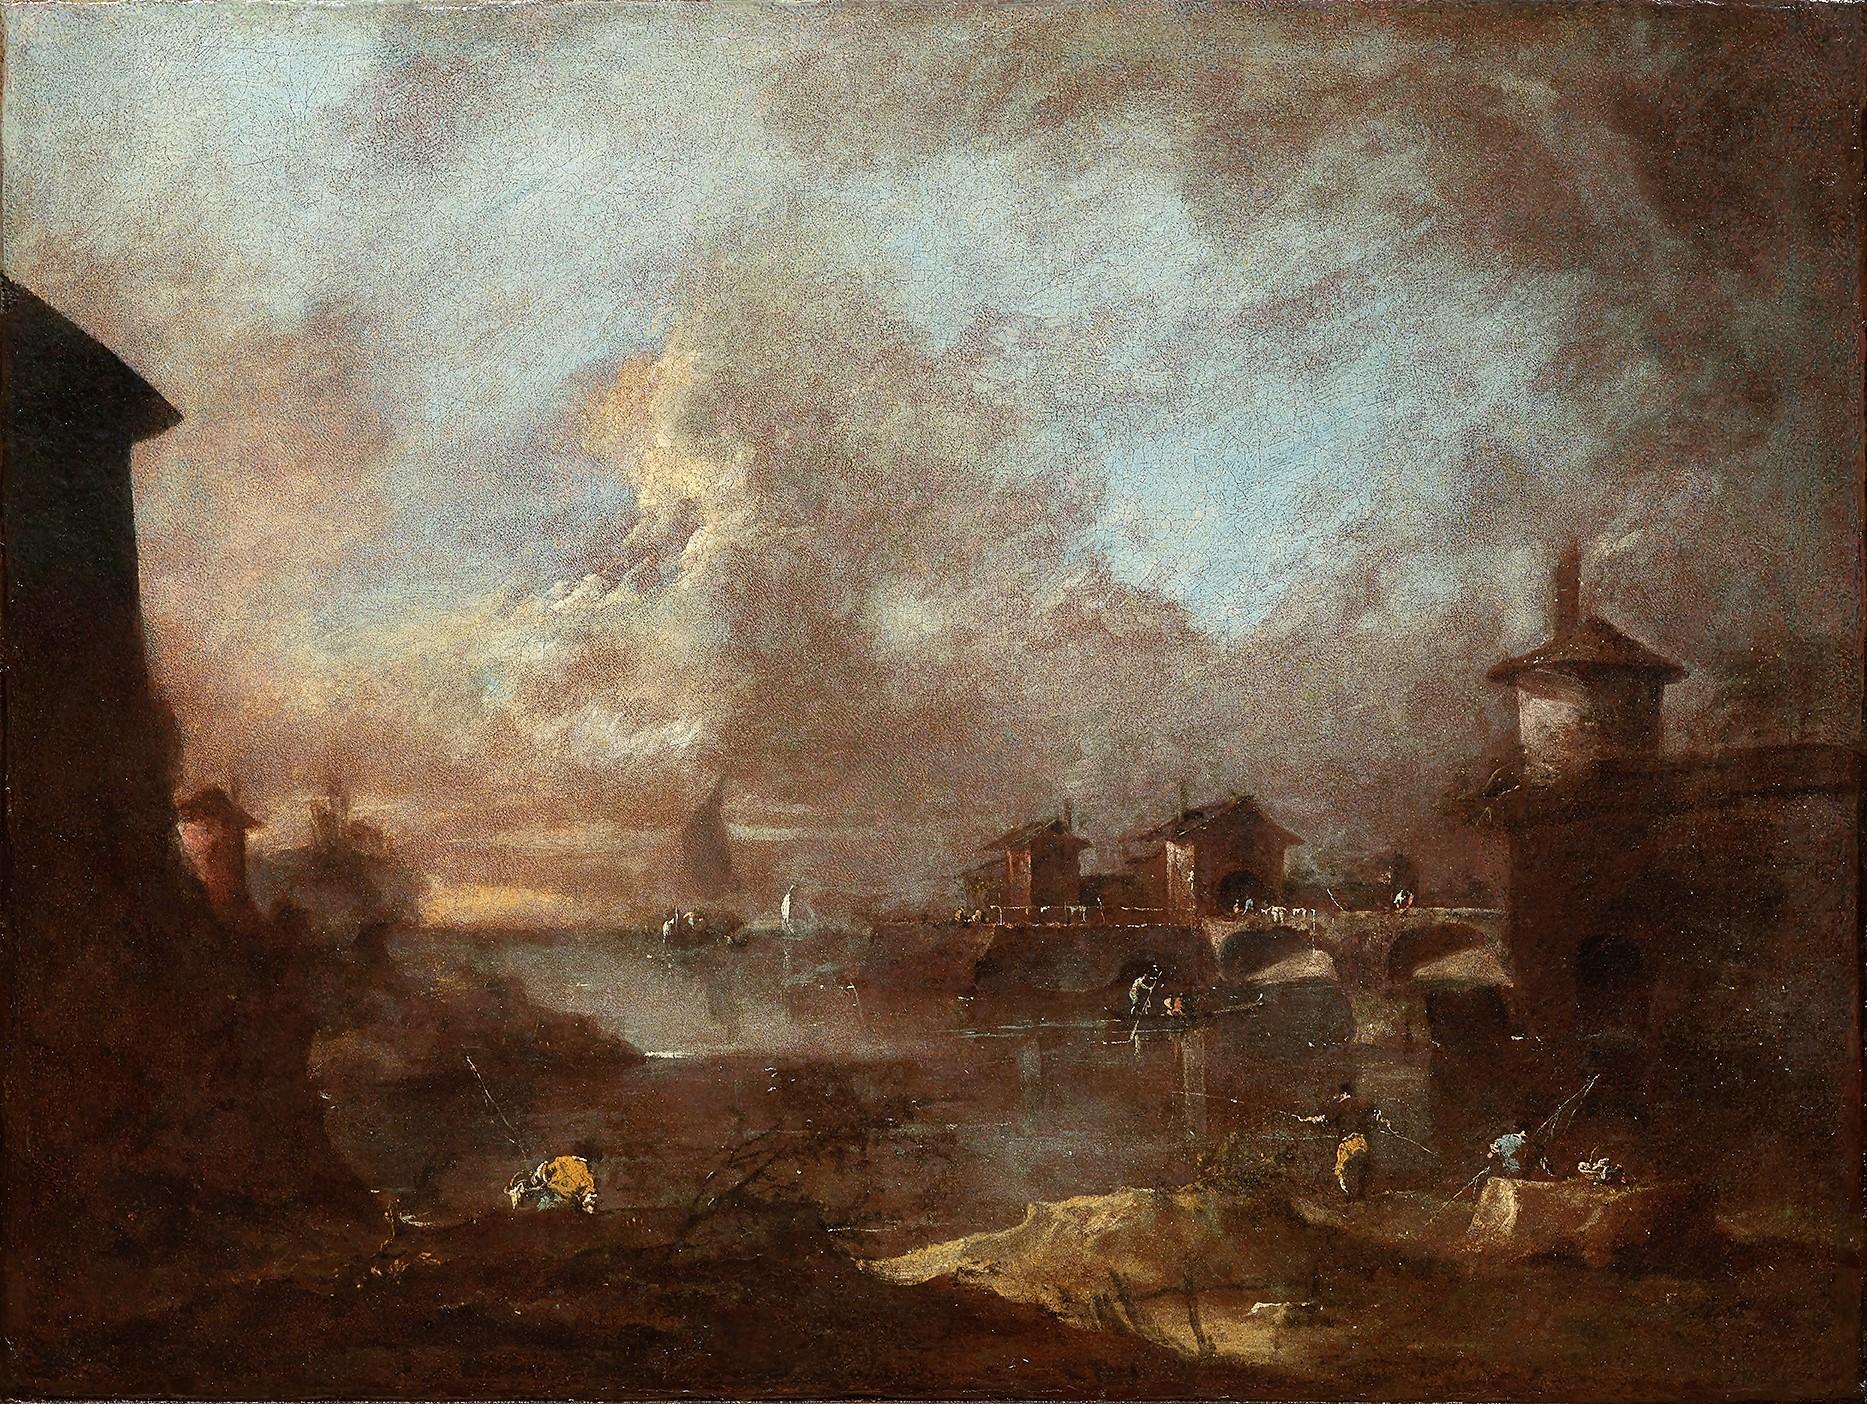 Lagoon Capriccio an original painting on linen by Francesco Guardi, (1712-1793)